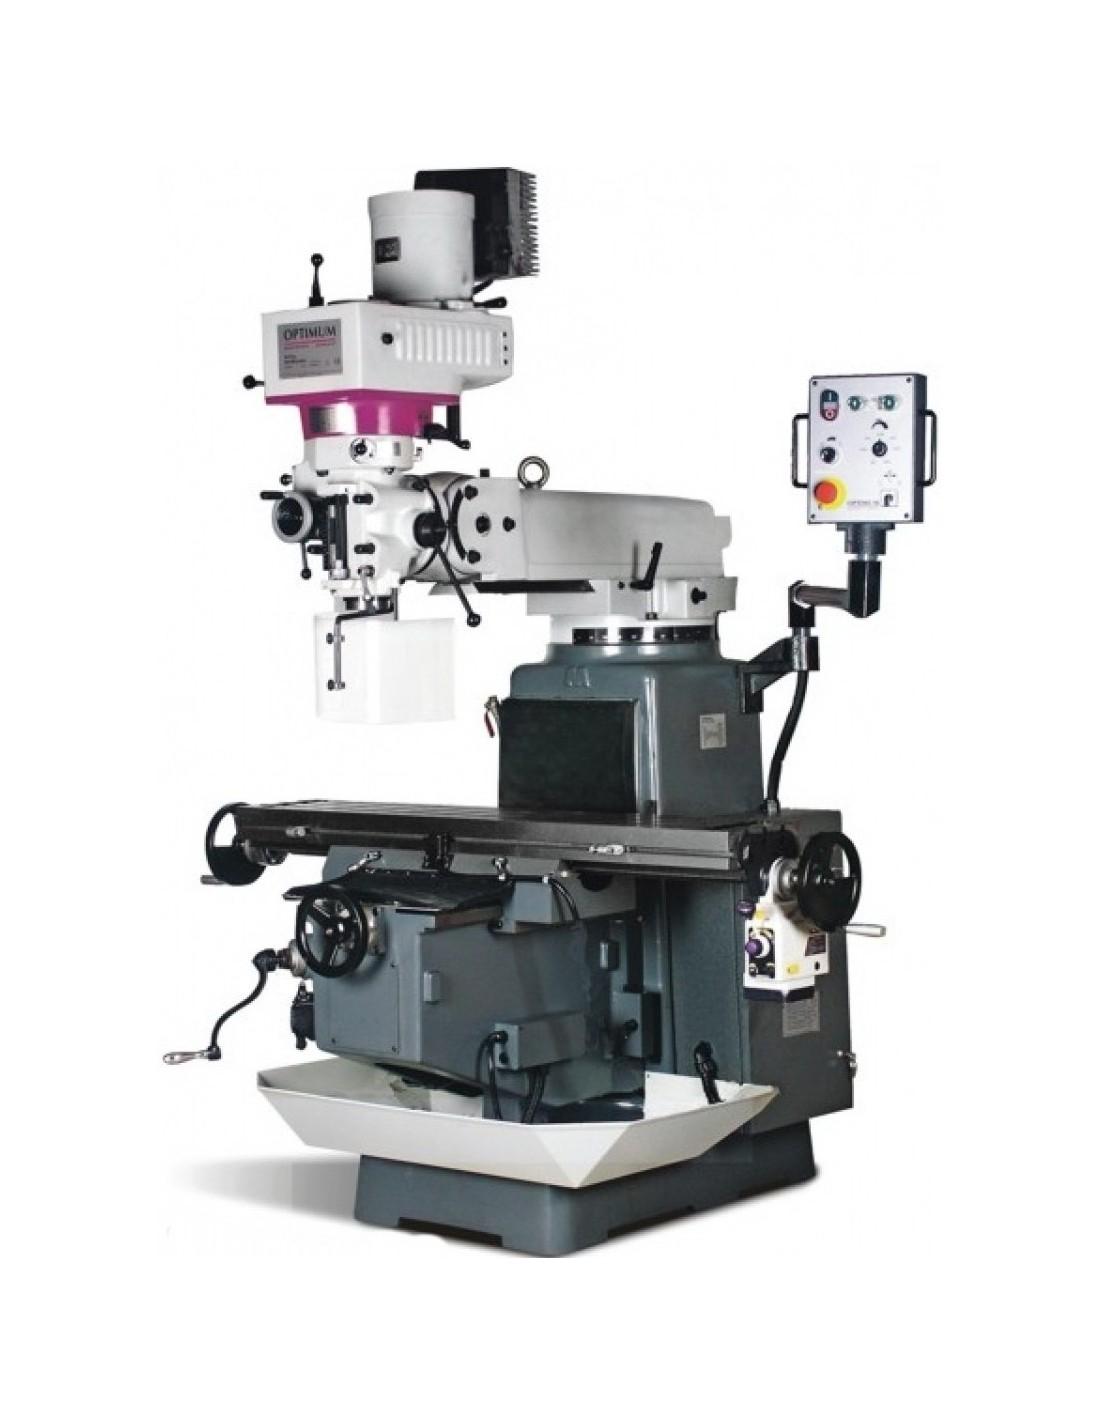 Masina de frezat multifunctionala Optimum MF 2 Vario DPA